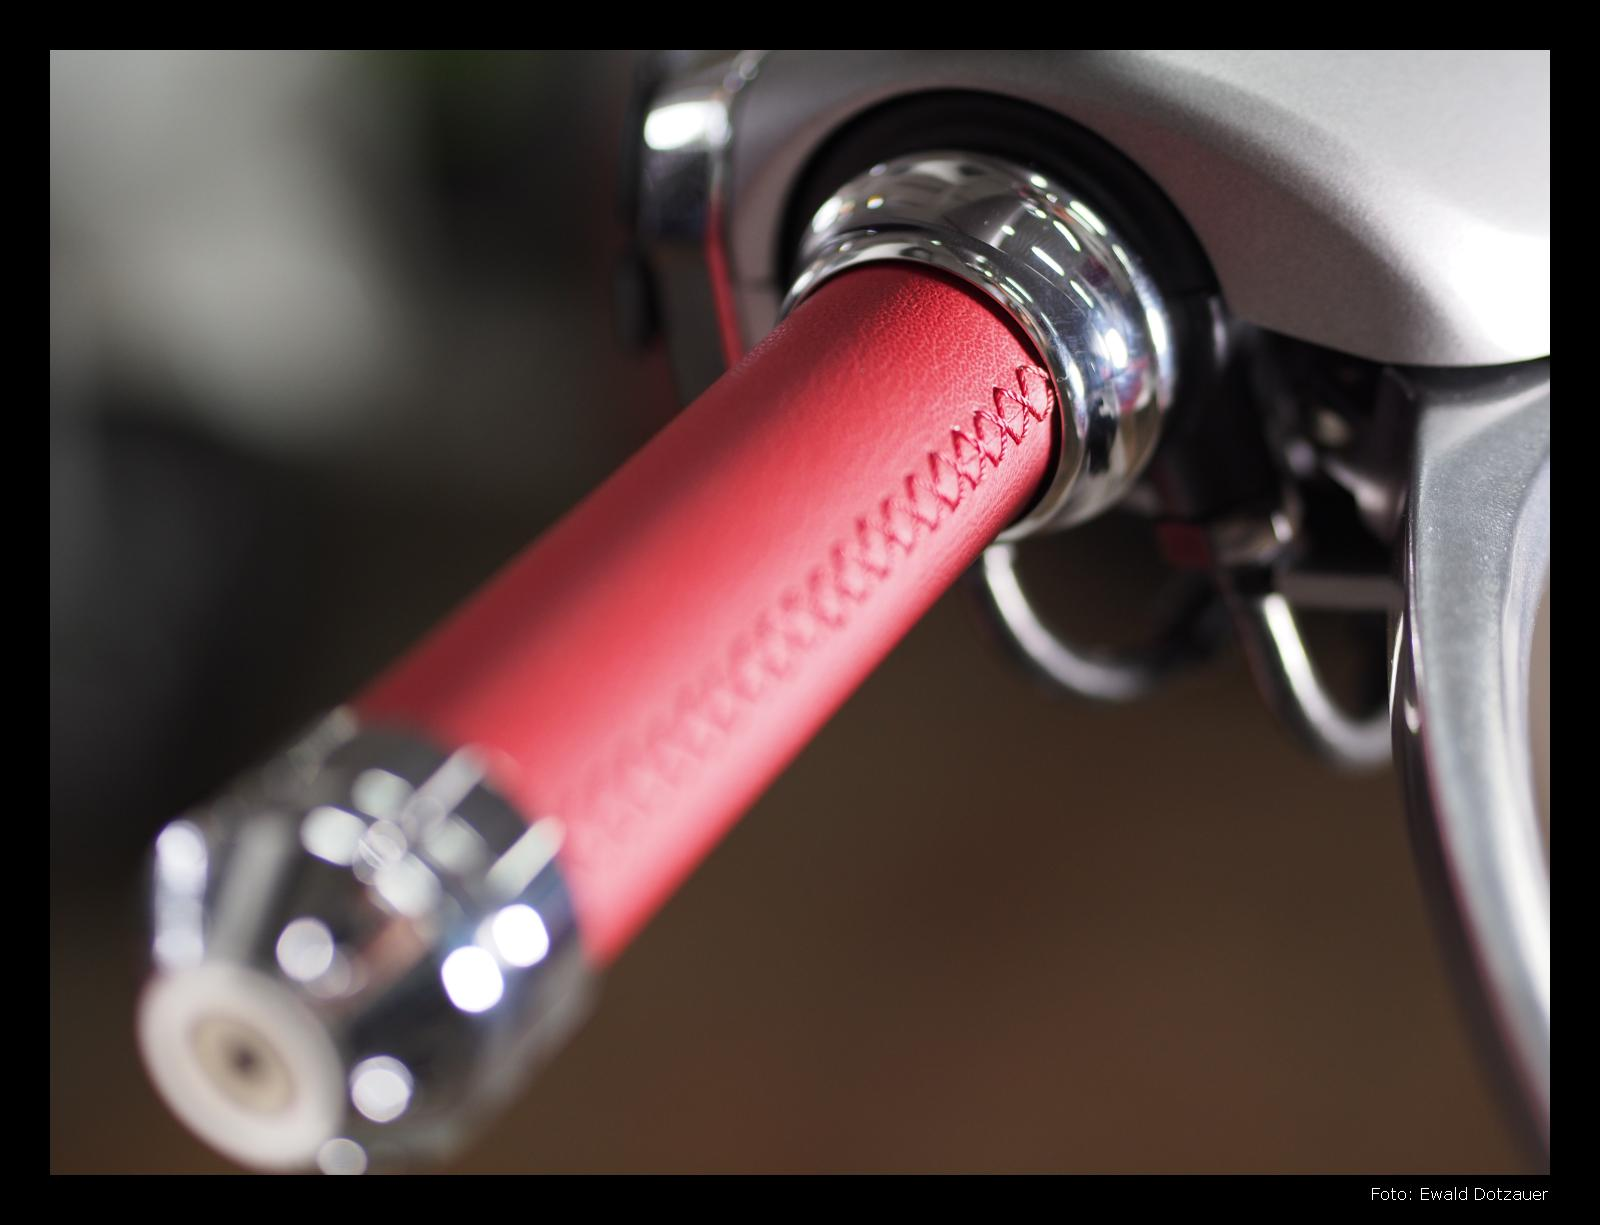 Vespa 946, Lenkergriff mit roten Leder überzogen, feine Handarbeit